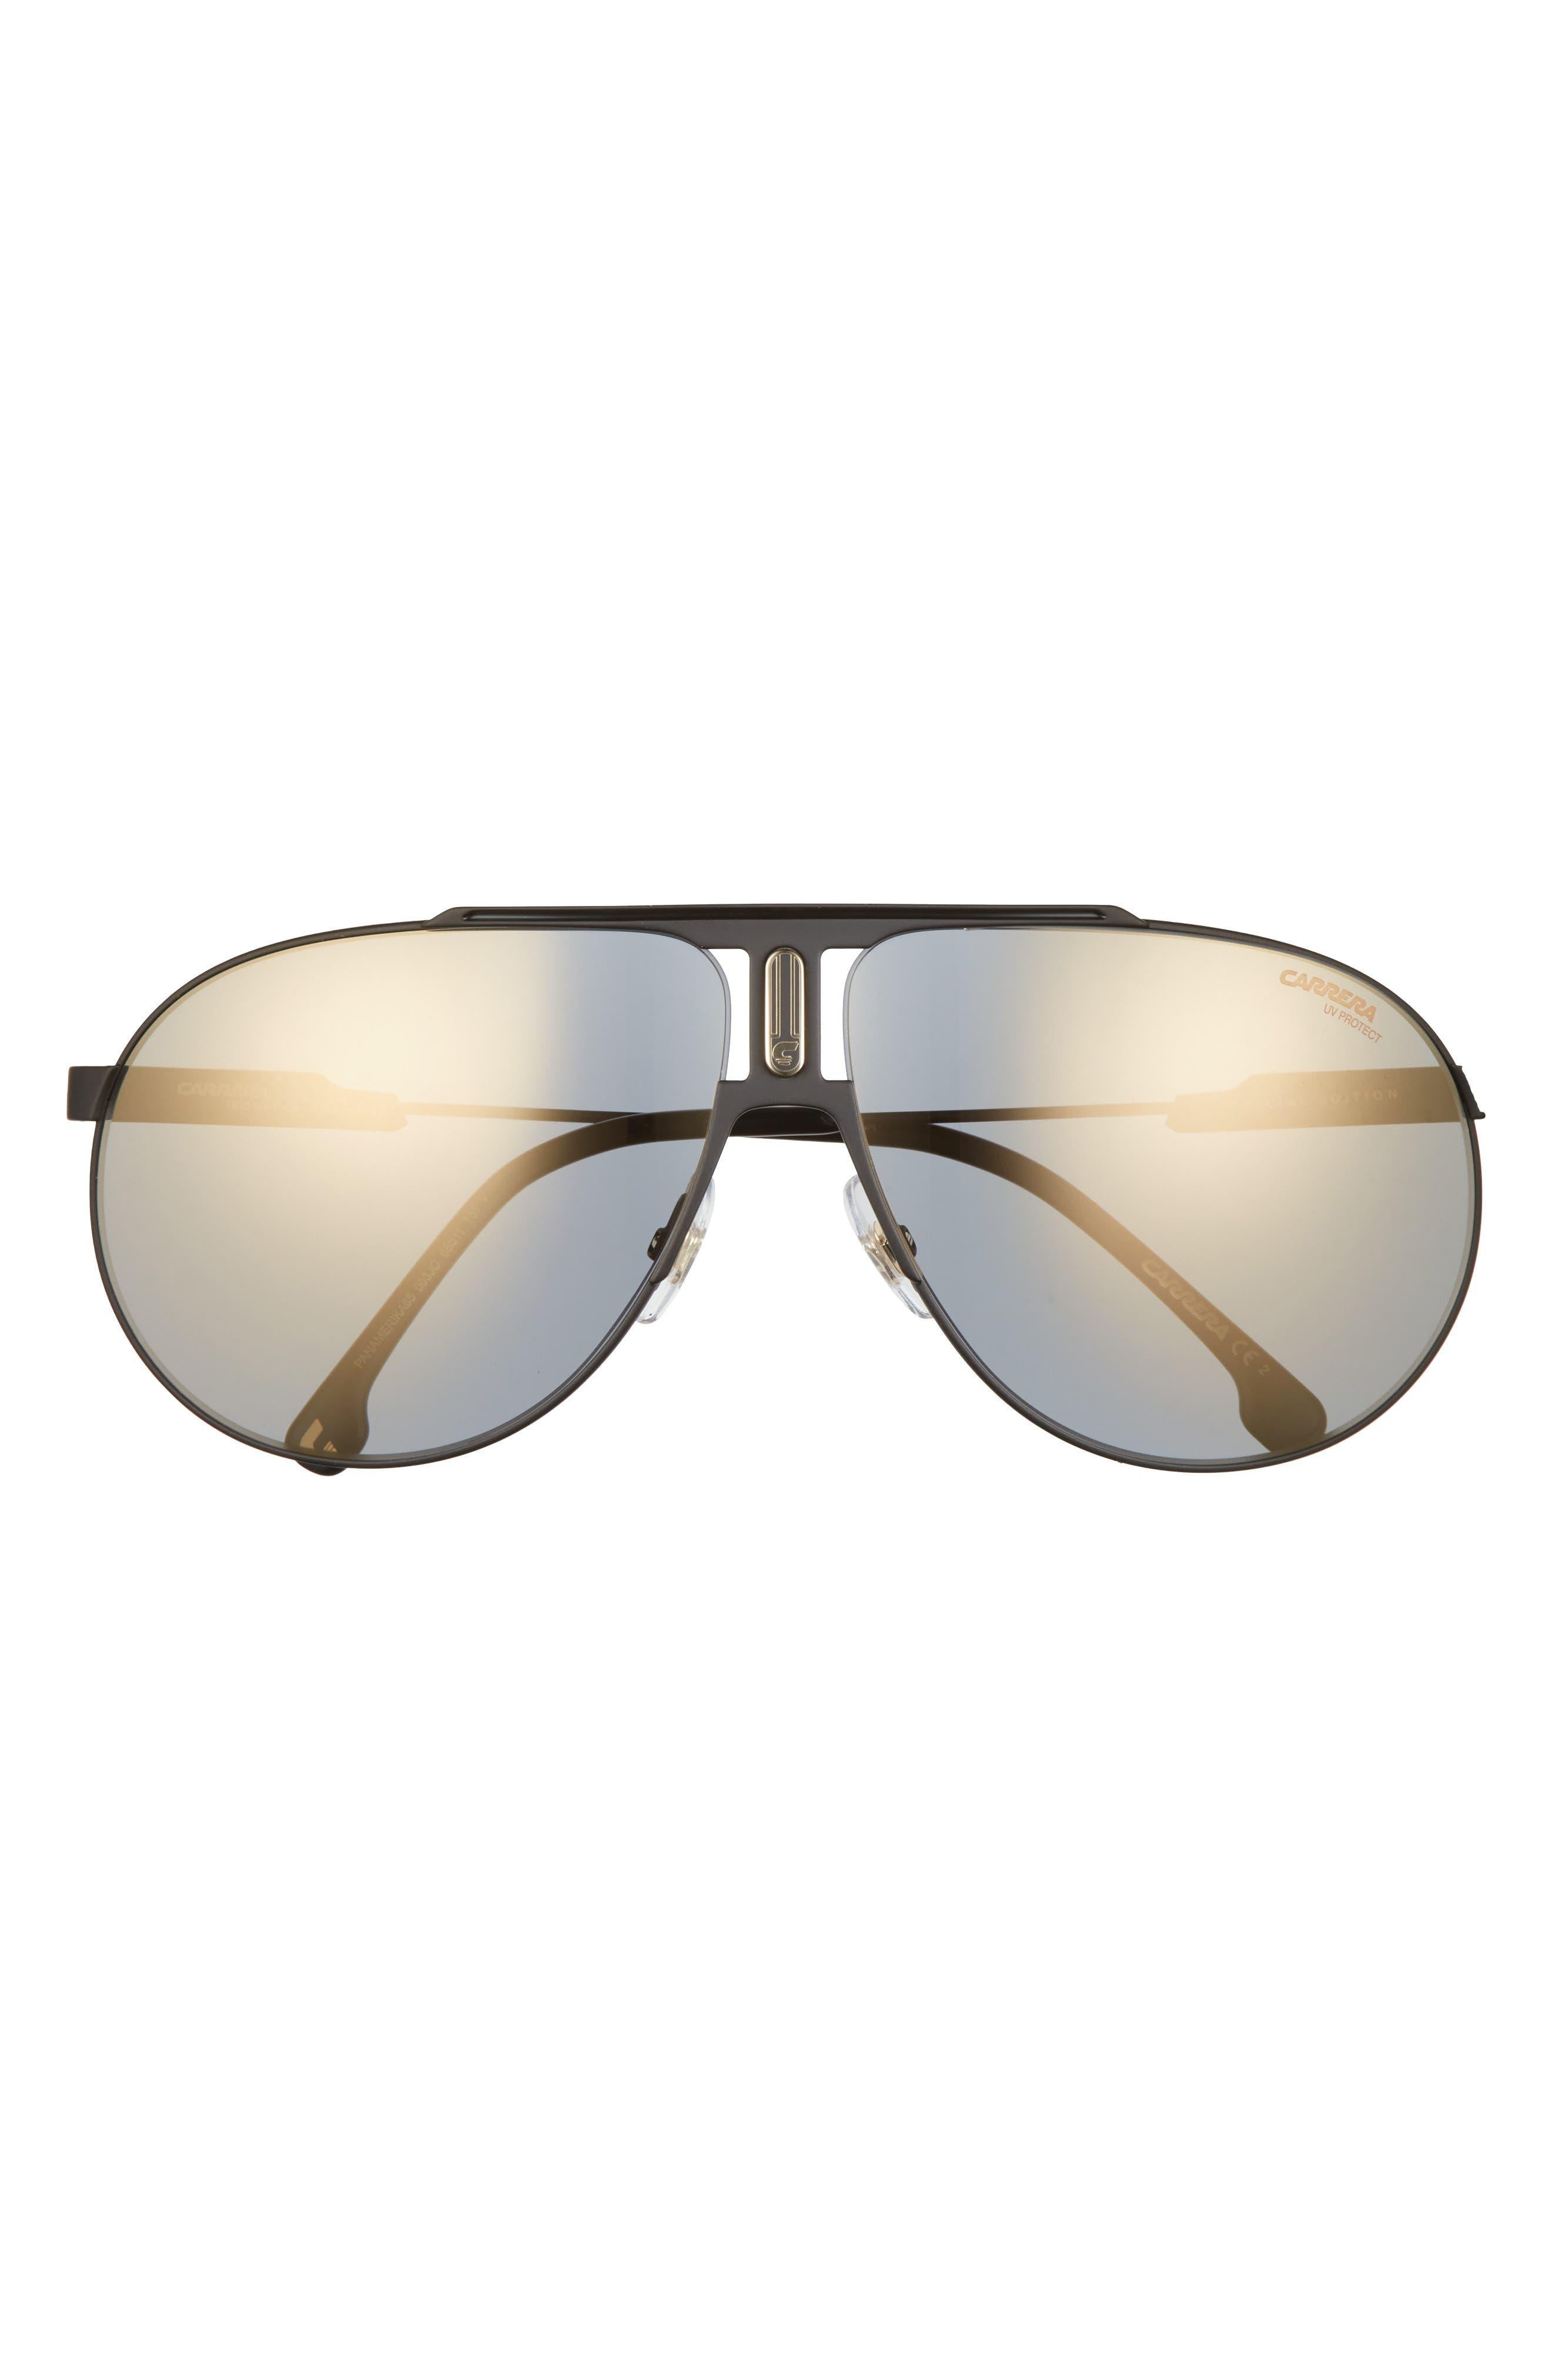 Panamerika 65mm Oversize Aviator Sunglasses